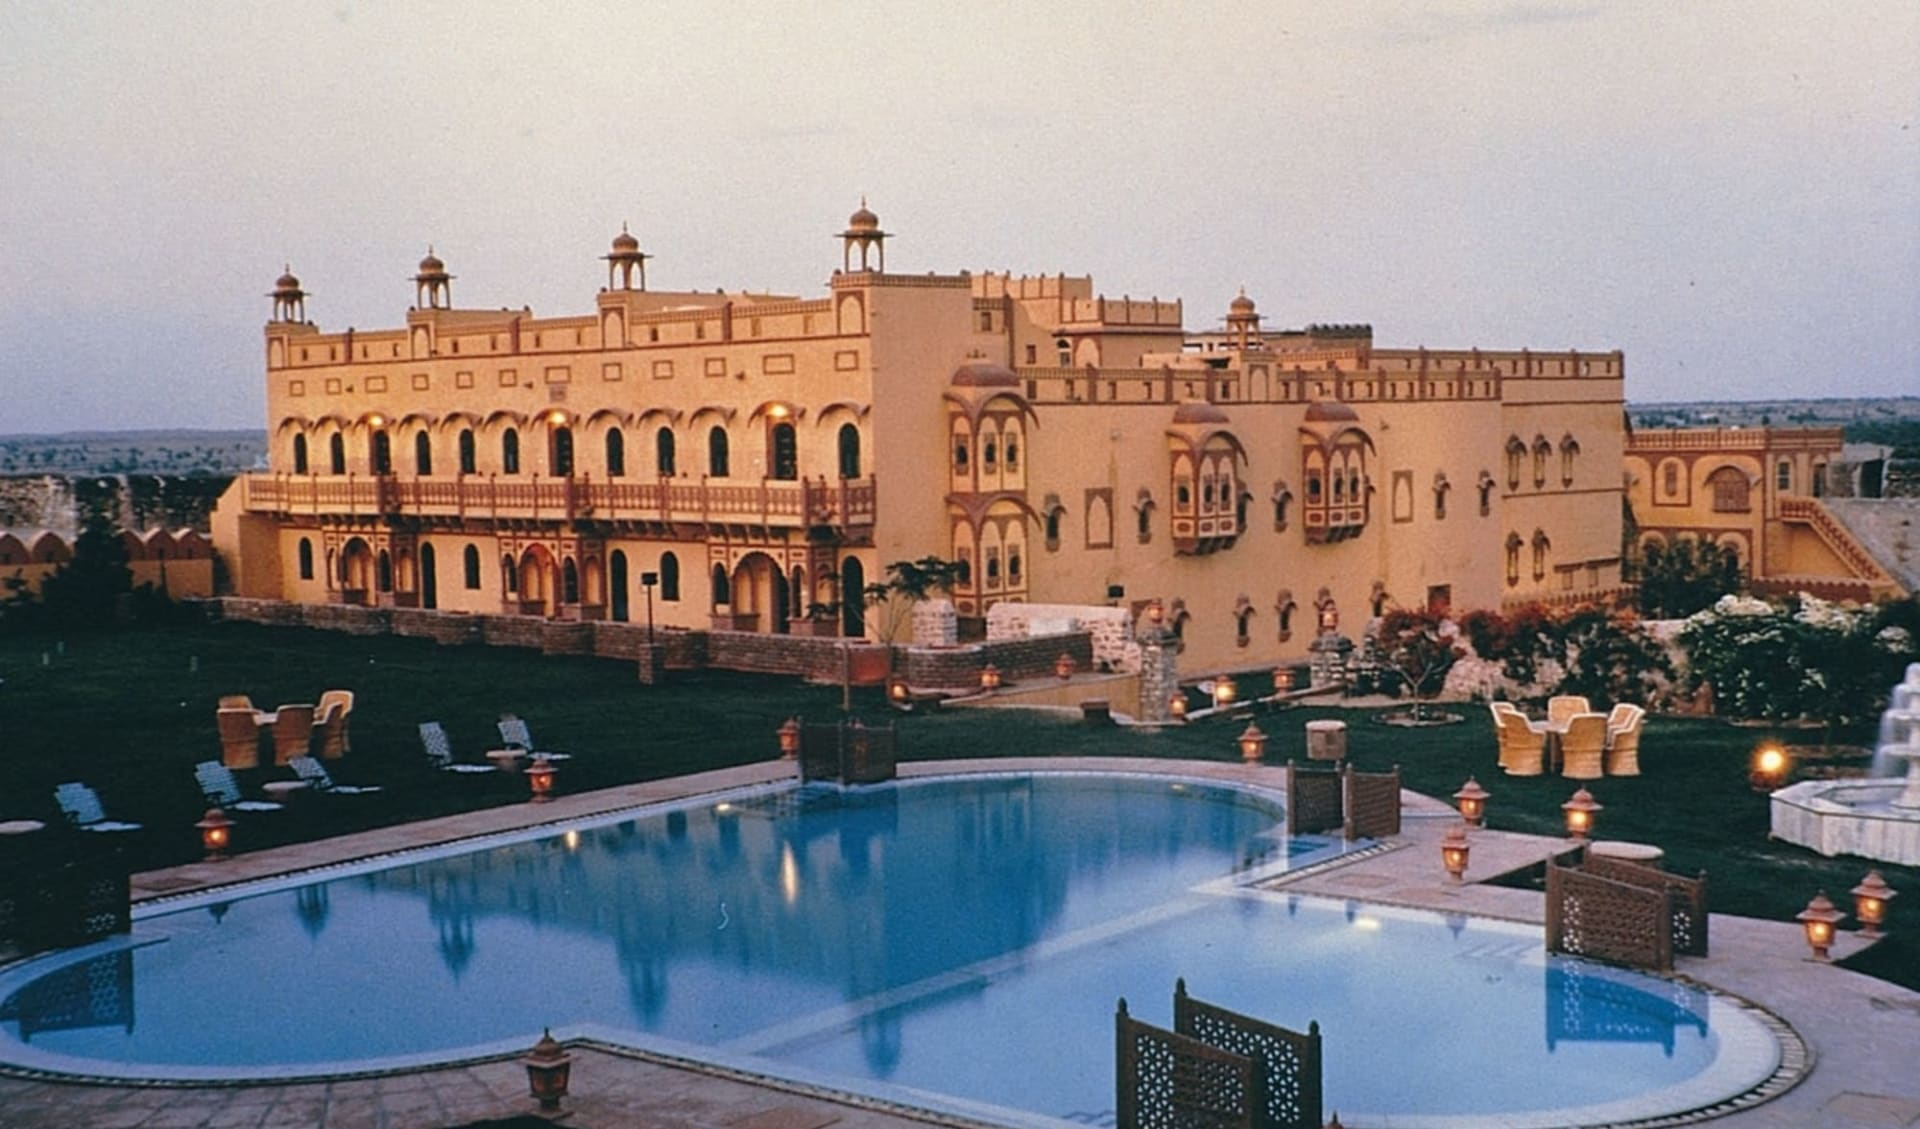 Palastromantik und Wüstenzauber ab Jodhpur: exterior: Khimsar Fort